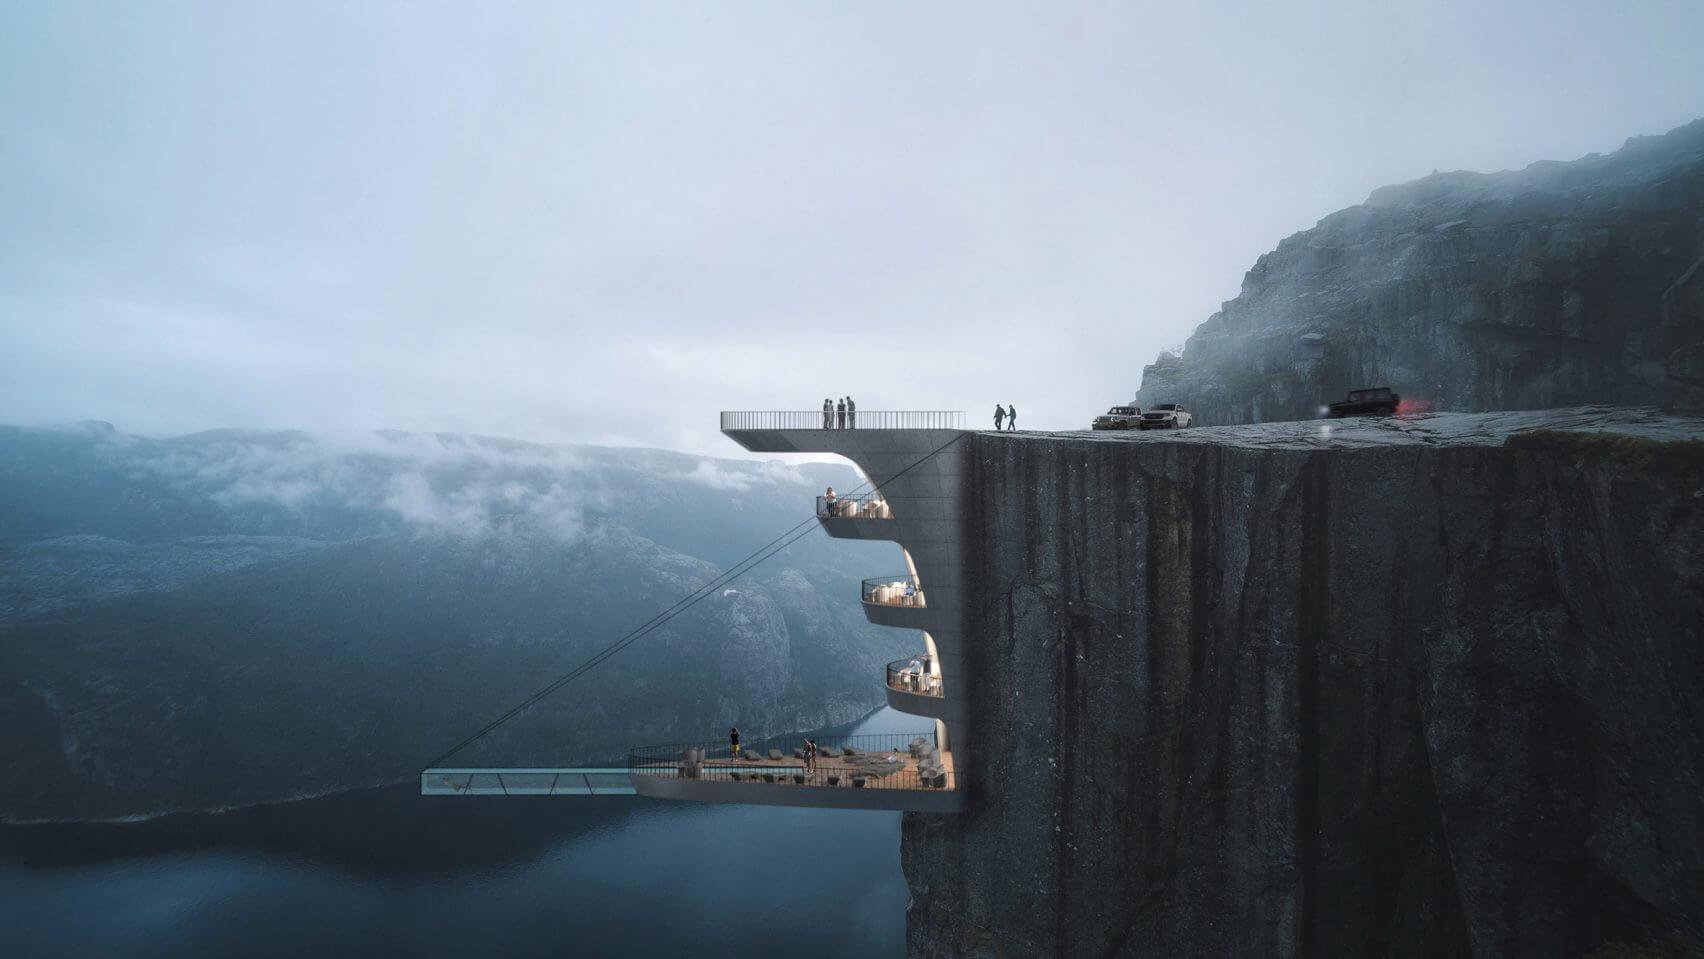 cliff-concept-boutique-hotel-by-hayri-atak-architectural-design-studio-norway-conceptual-architecture_dezeen_2364_hero-1704x959